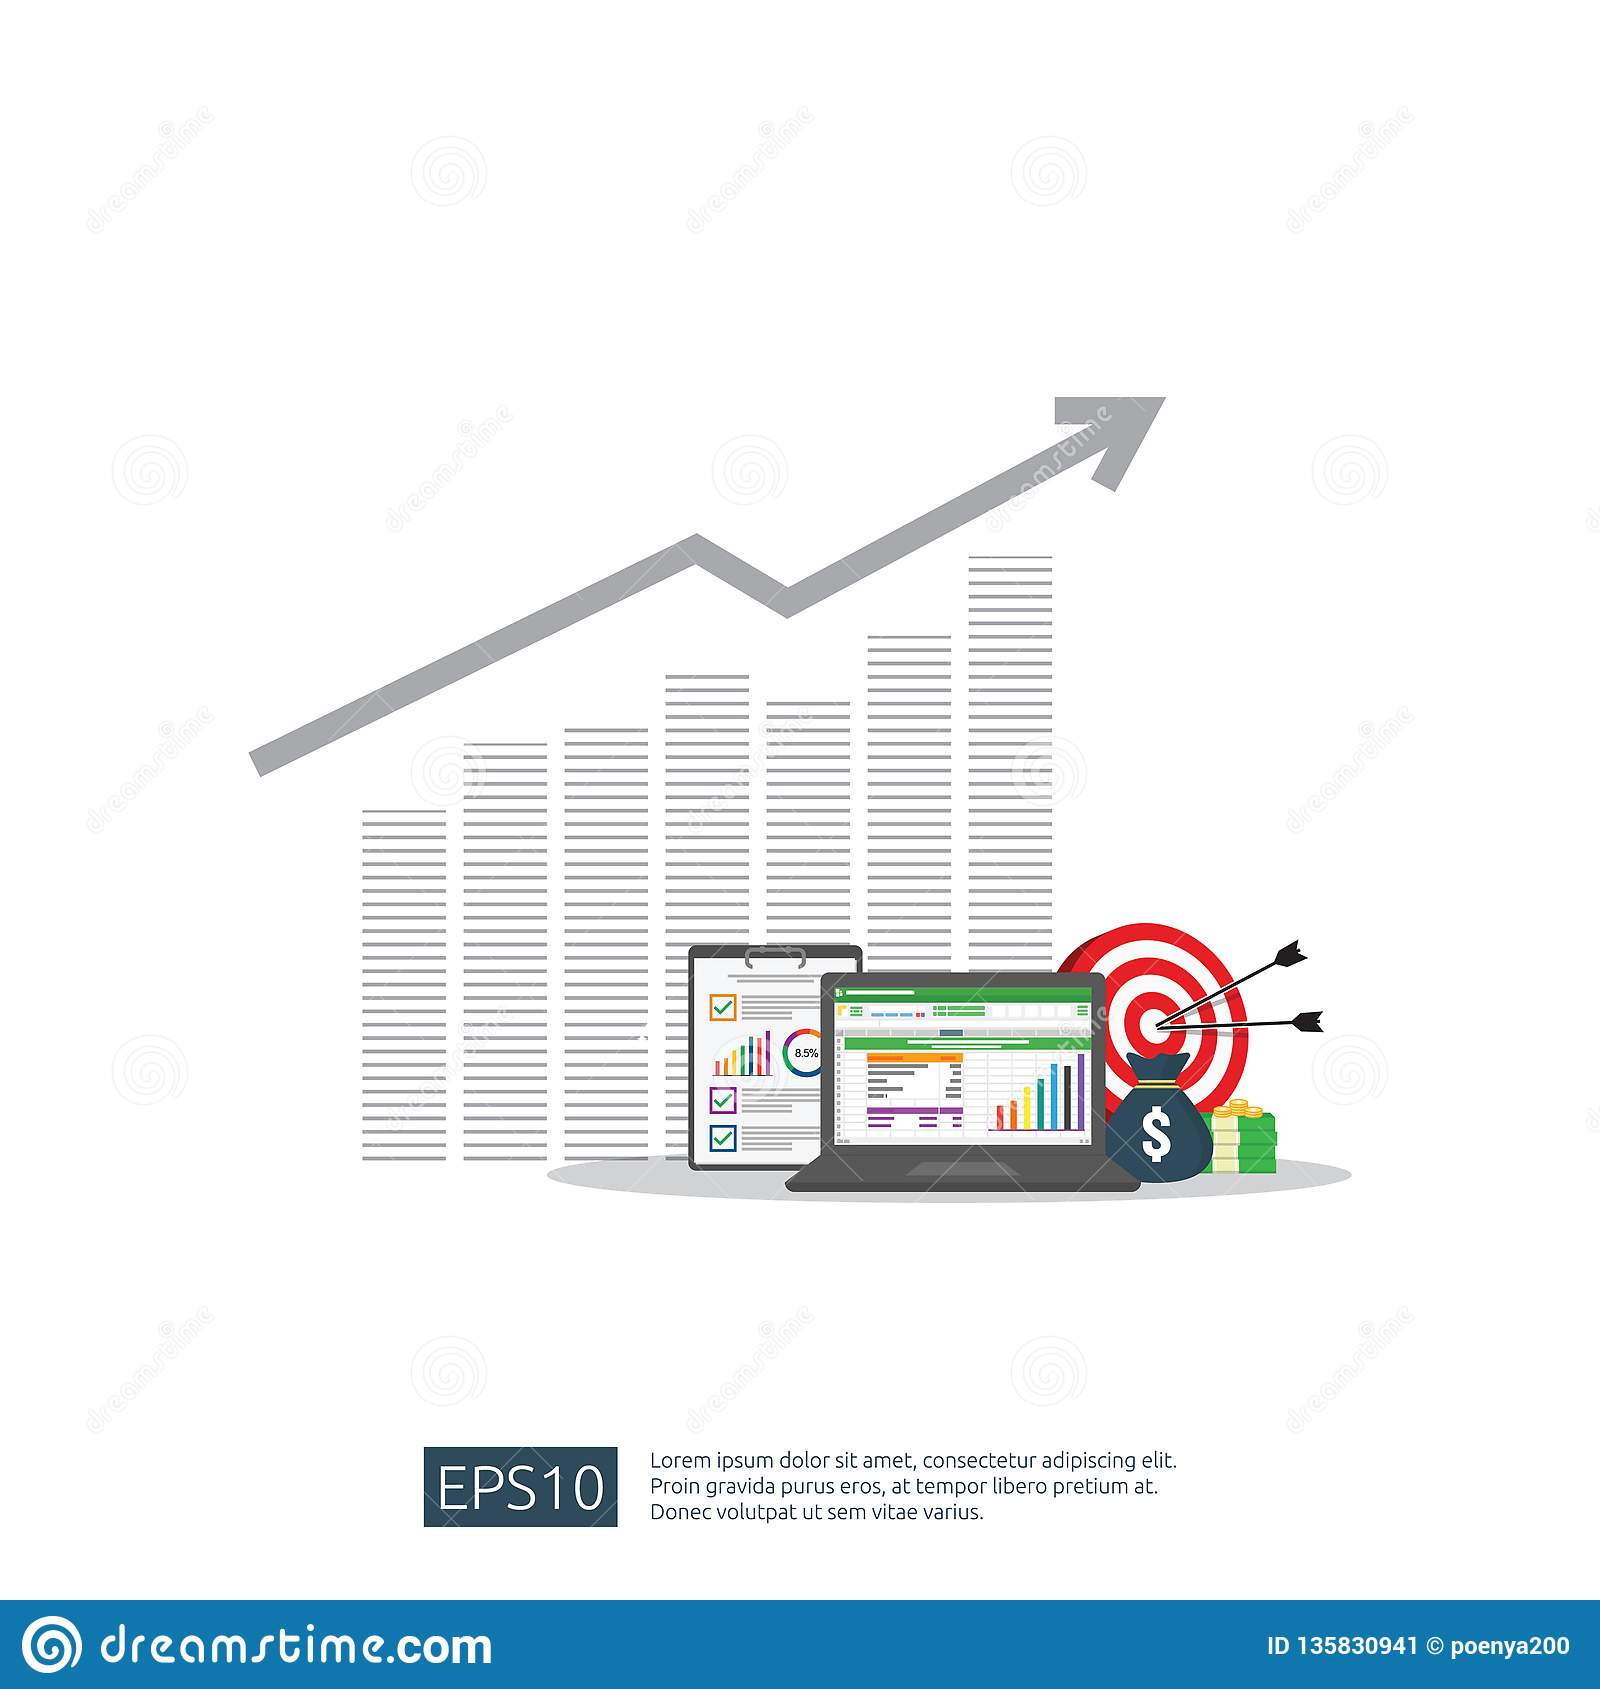 Roi Analysis Spreadsheet Pertaining To Big Data Analysis On Screen. Seo Analytic Or Spreadsheet Business Roi Analysis Spreadsheet Printable Spreadshee Printable Spreadshee roi analysis excel spreadsheet